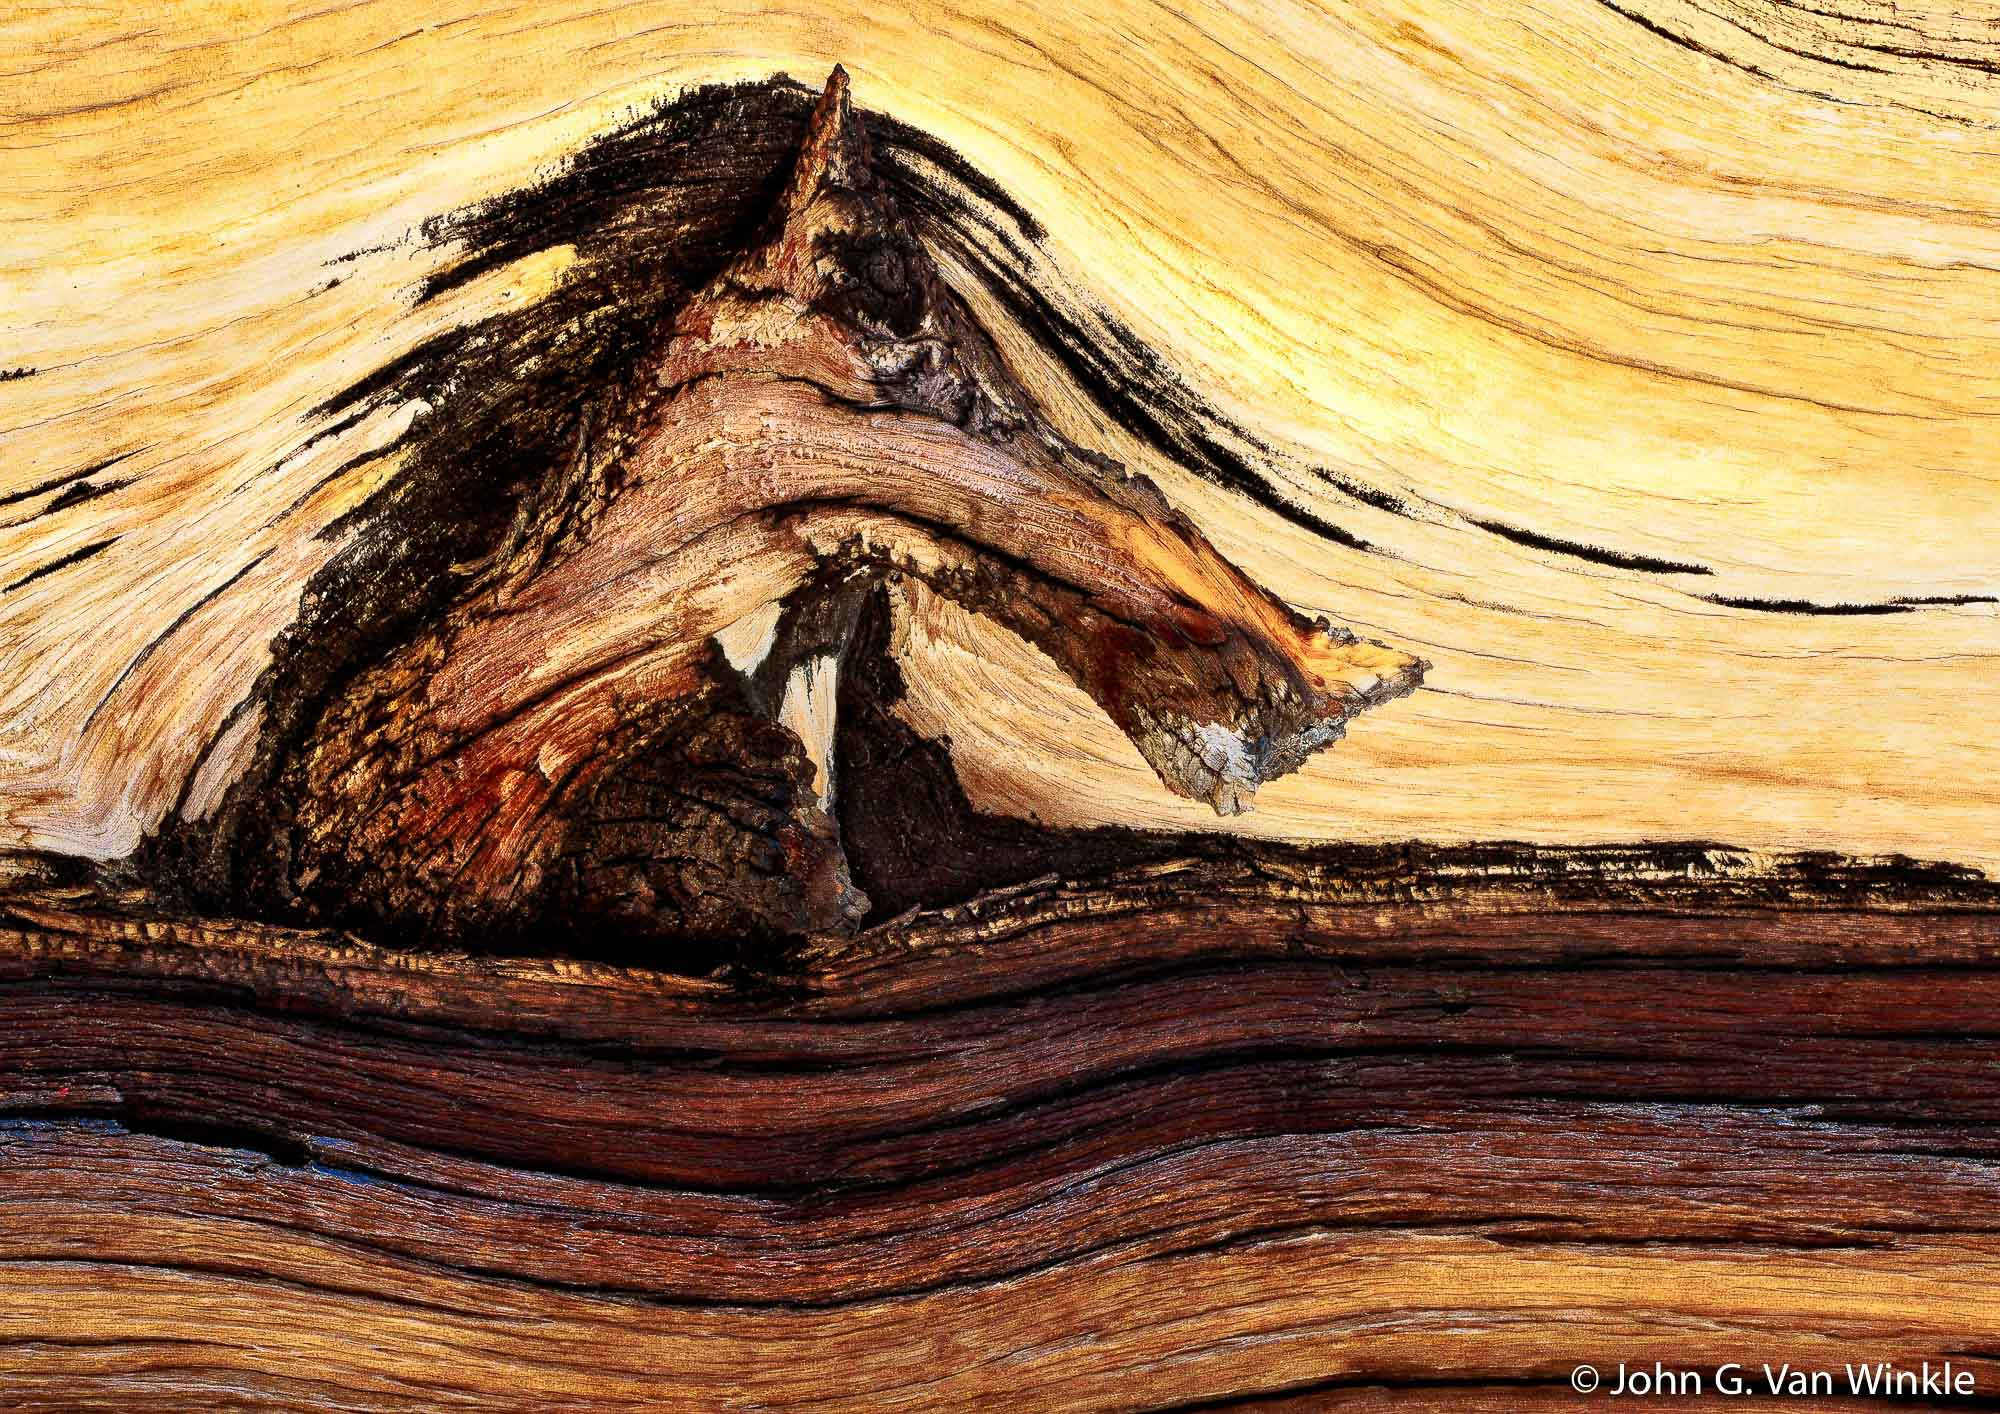 Bark Design on Bristlecone Pine, White Mountains, California